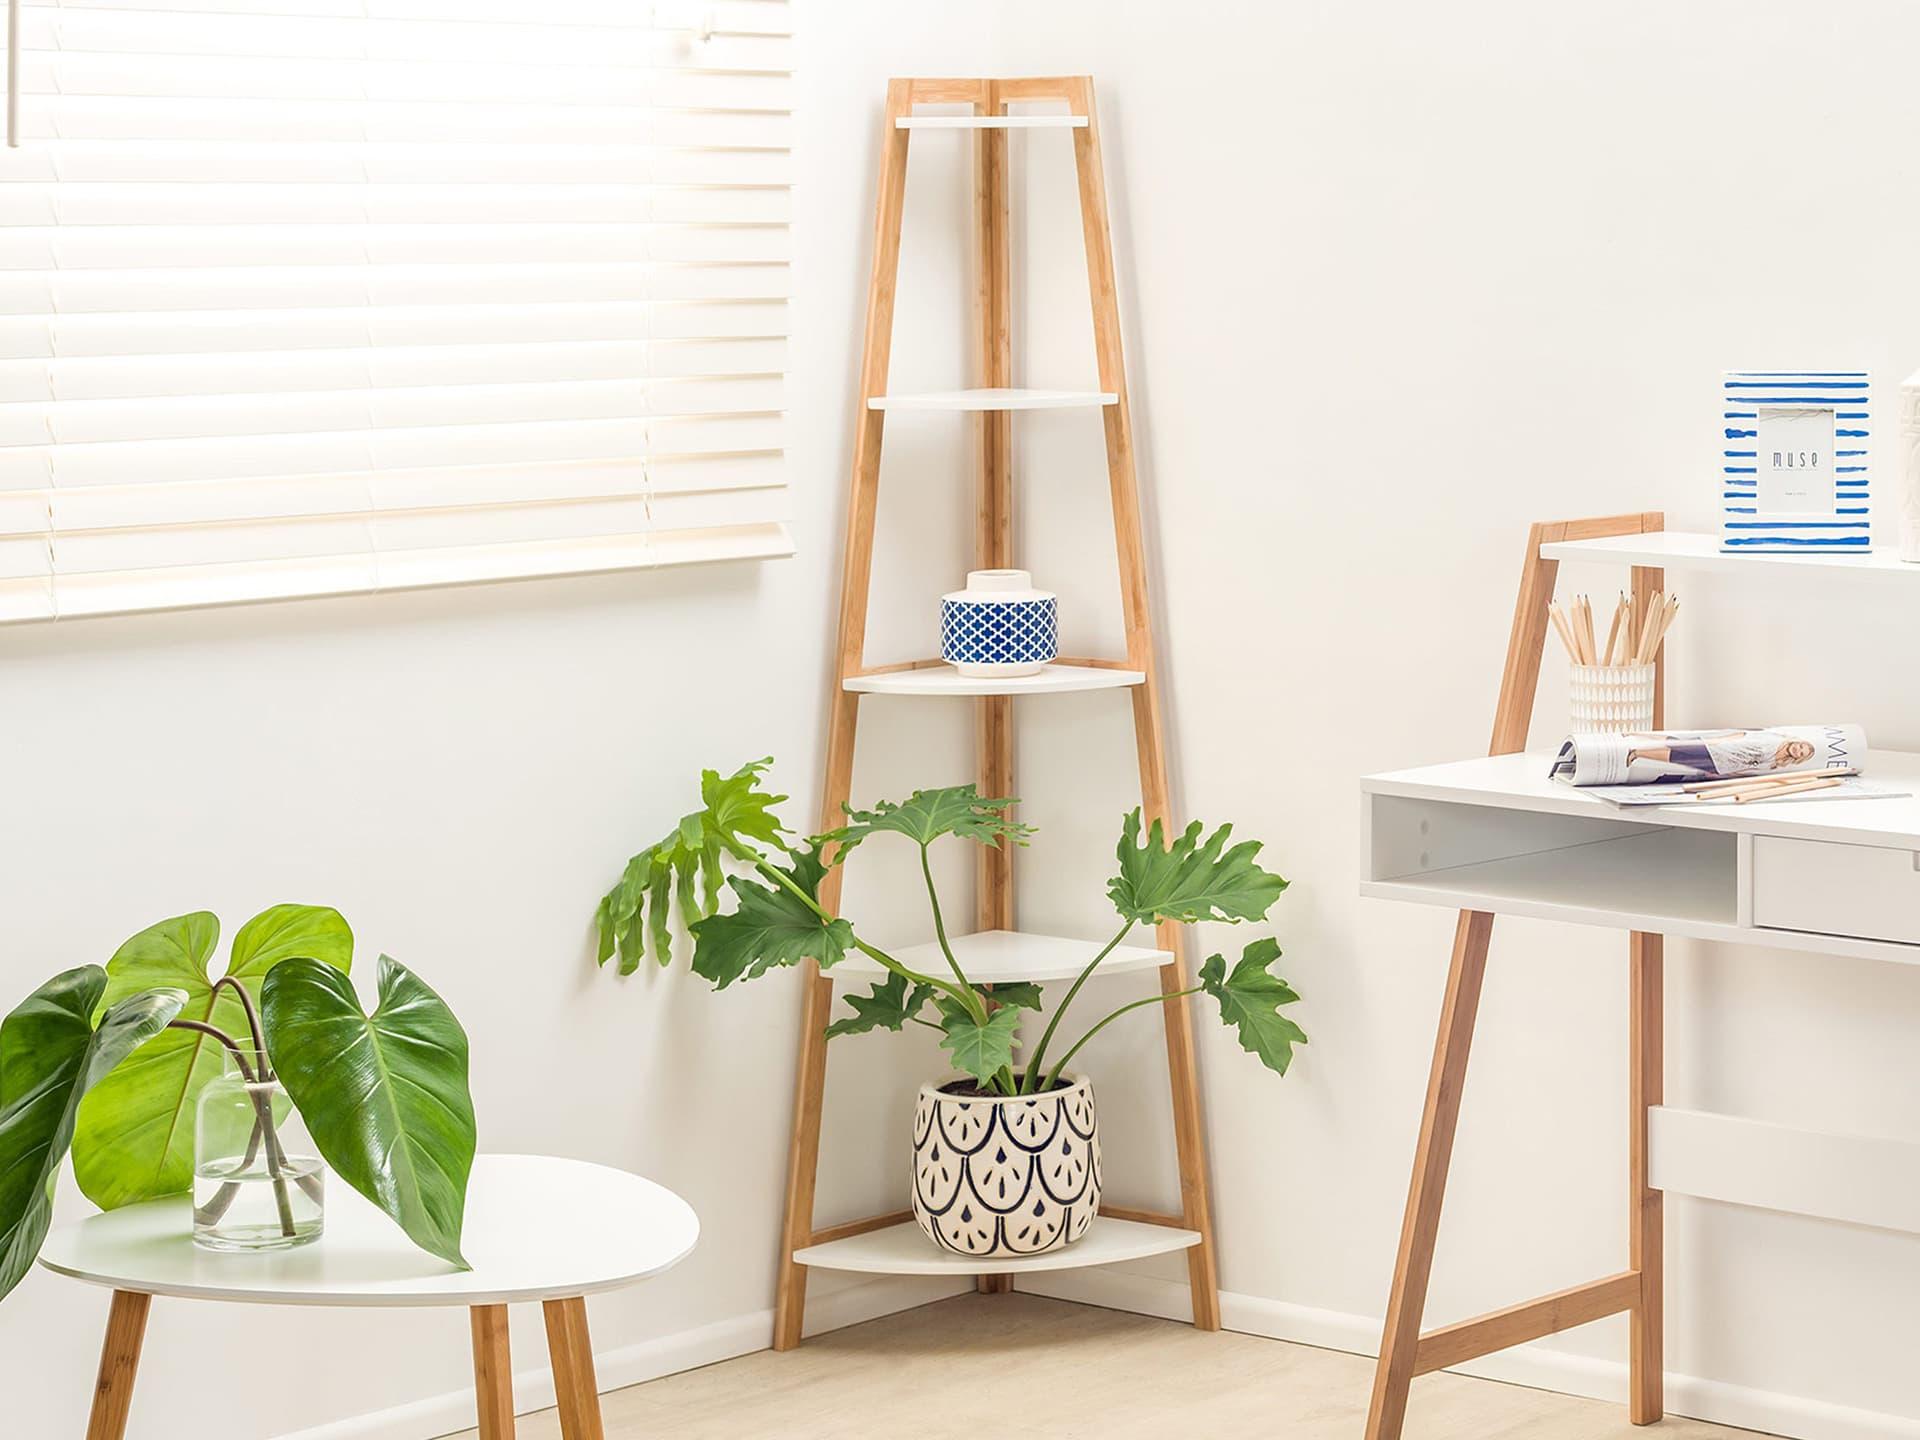 Maya corner shelf in white and blonde timber in corner of room